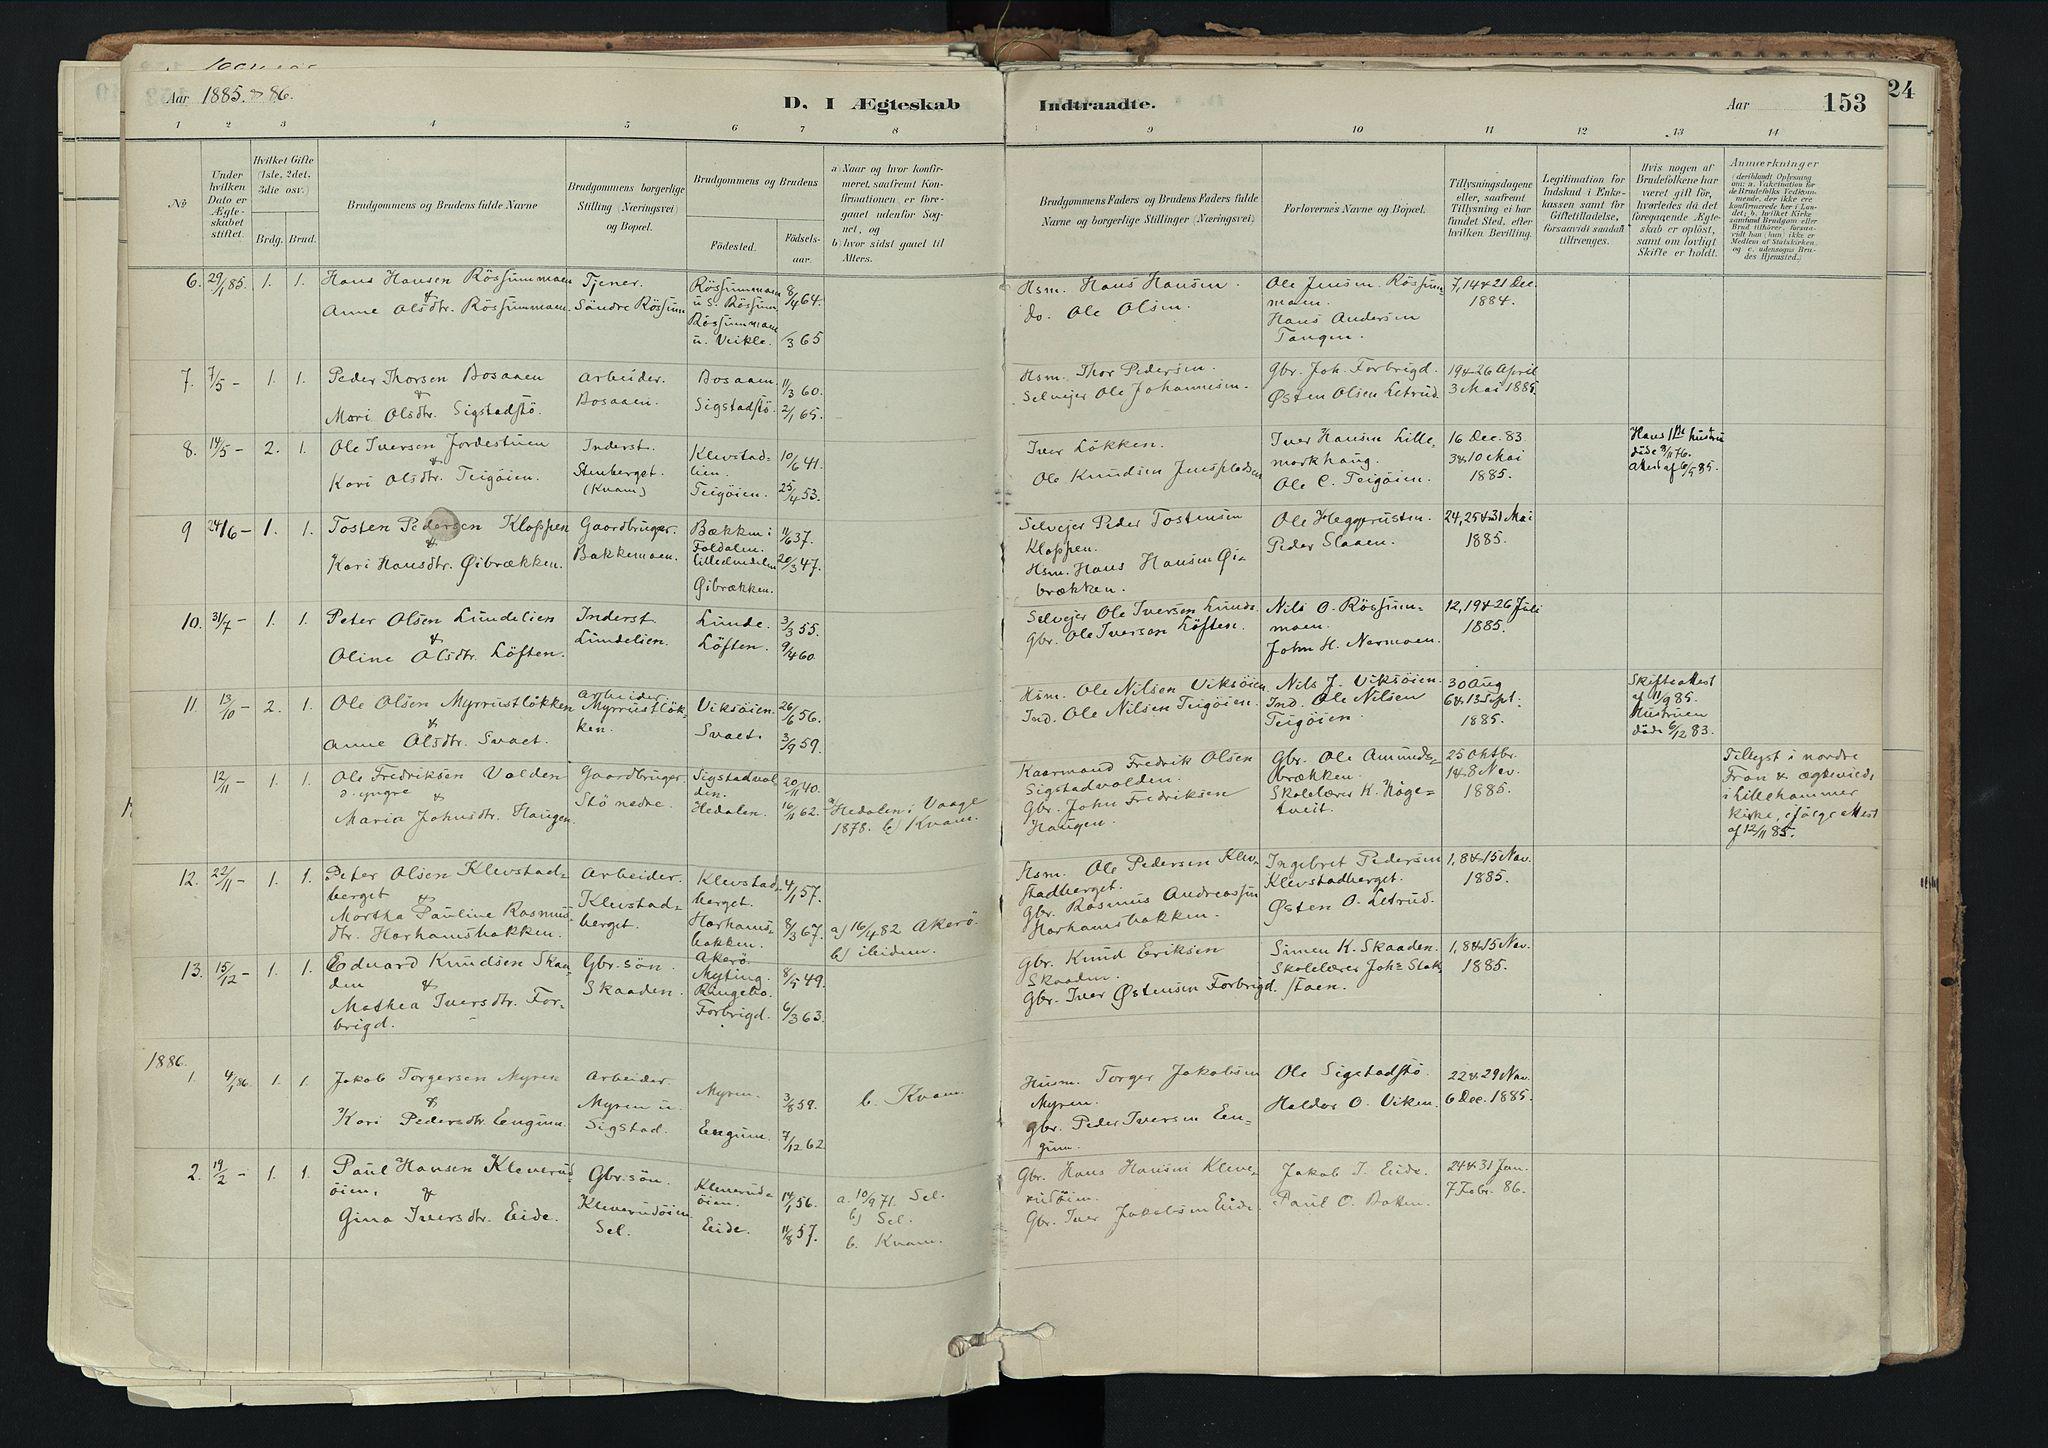 SAH, Nord-Fron prestekontor, Ministerialbok nr. 3, 1884-1914, s. 153